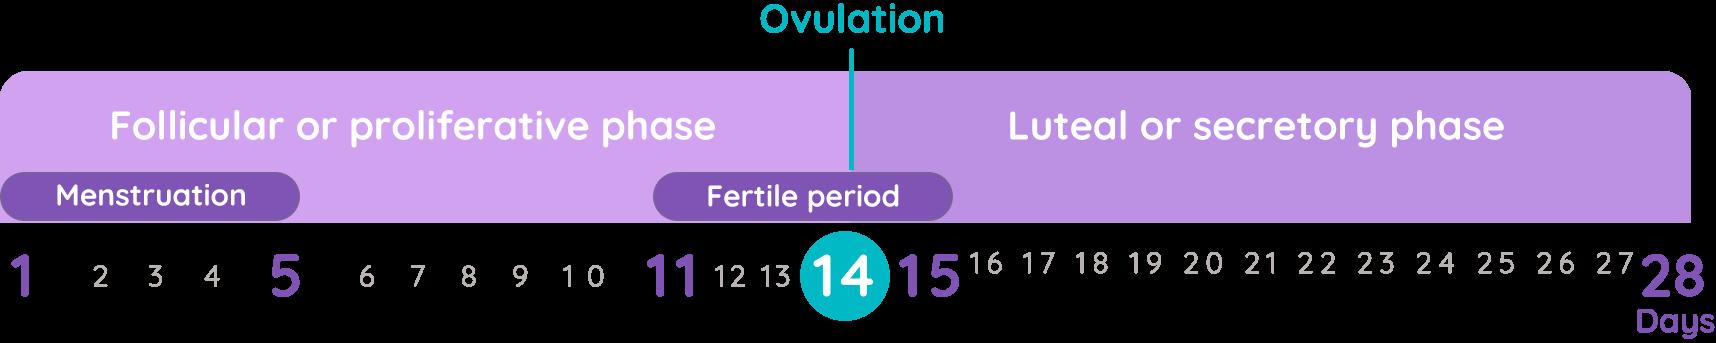 Pregnancy ovulation period